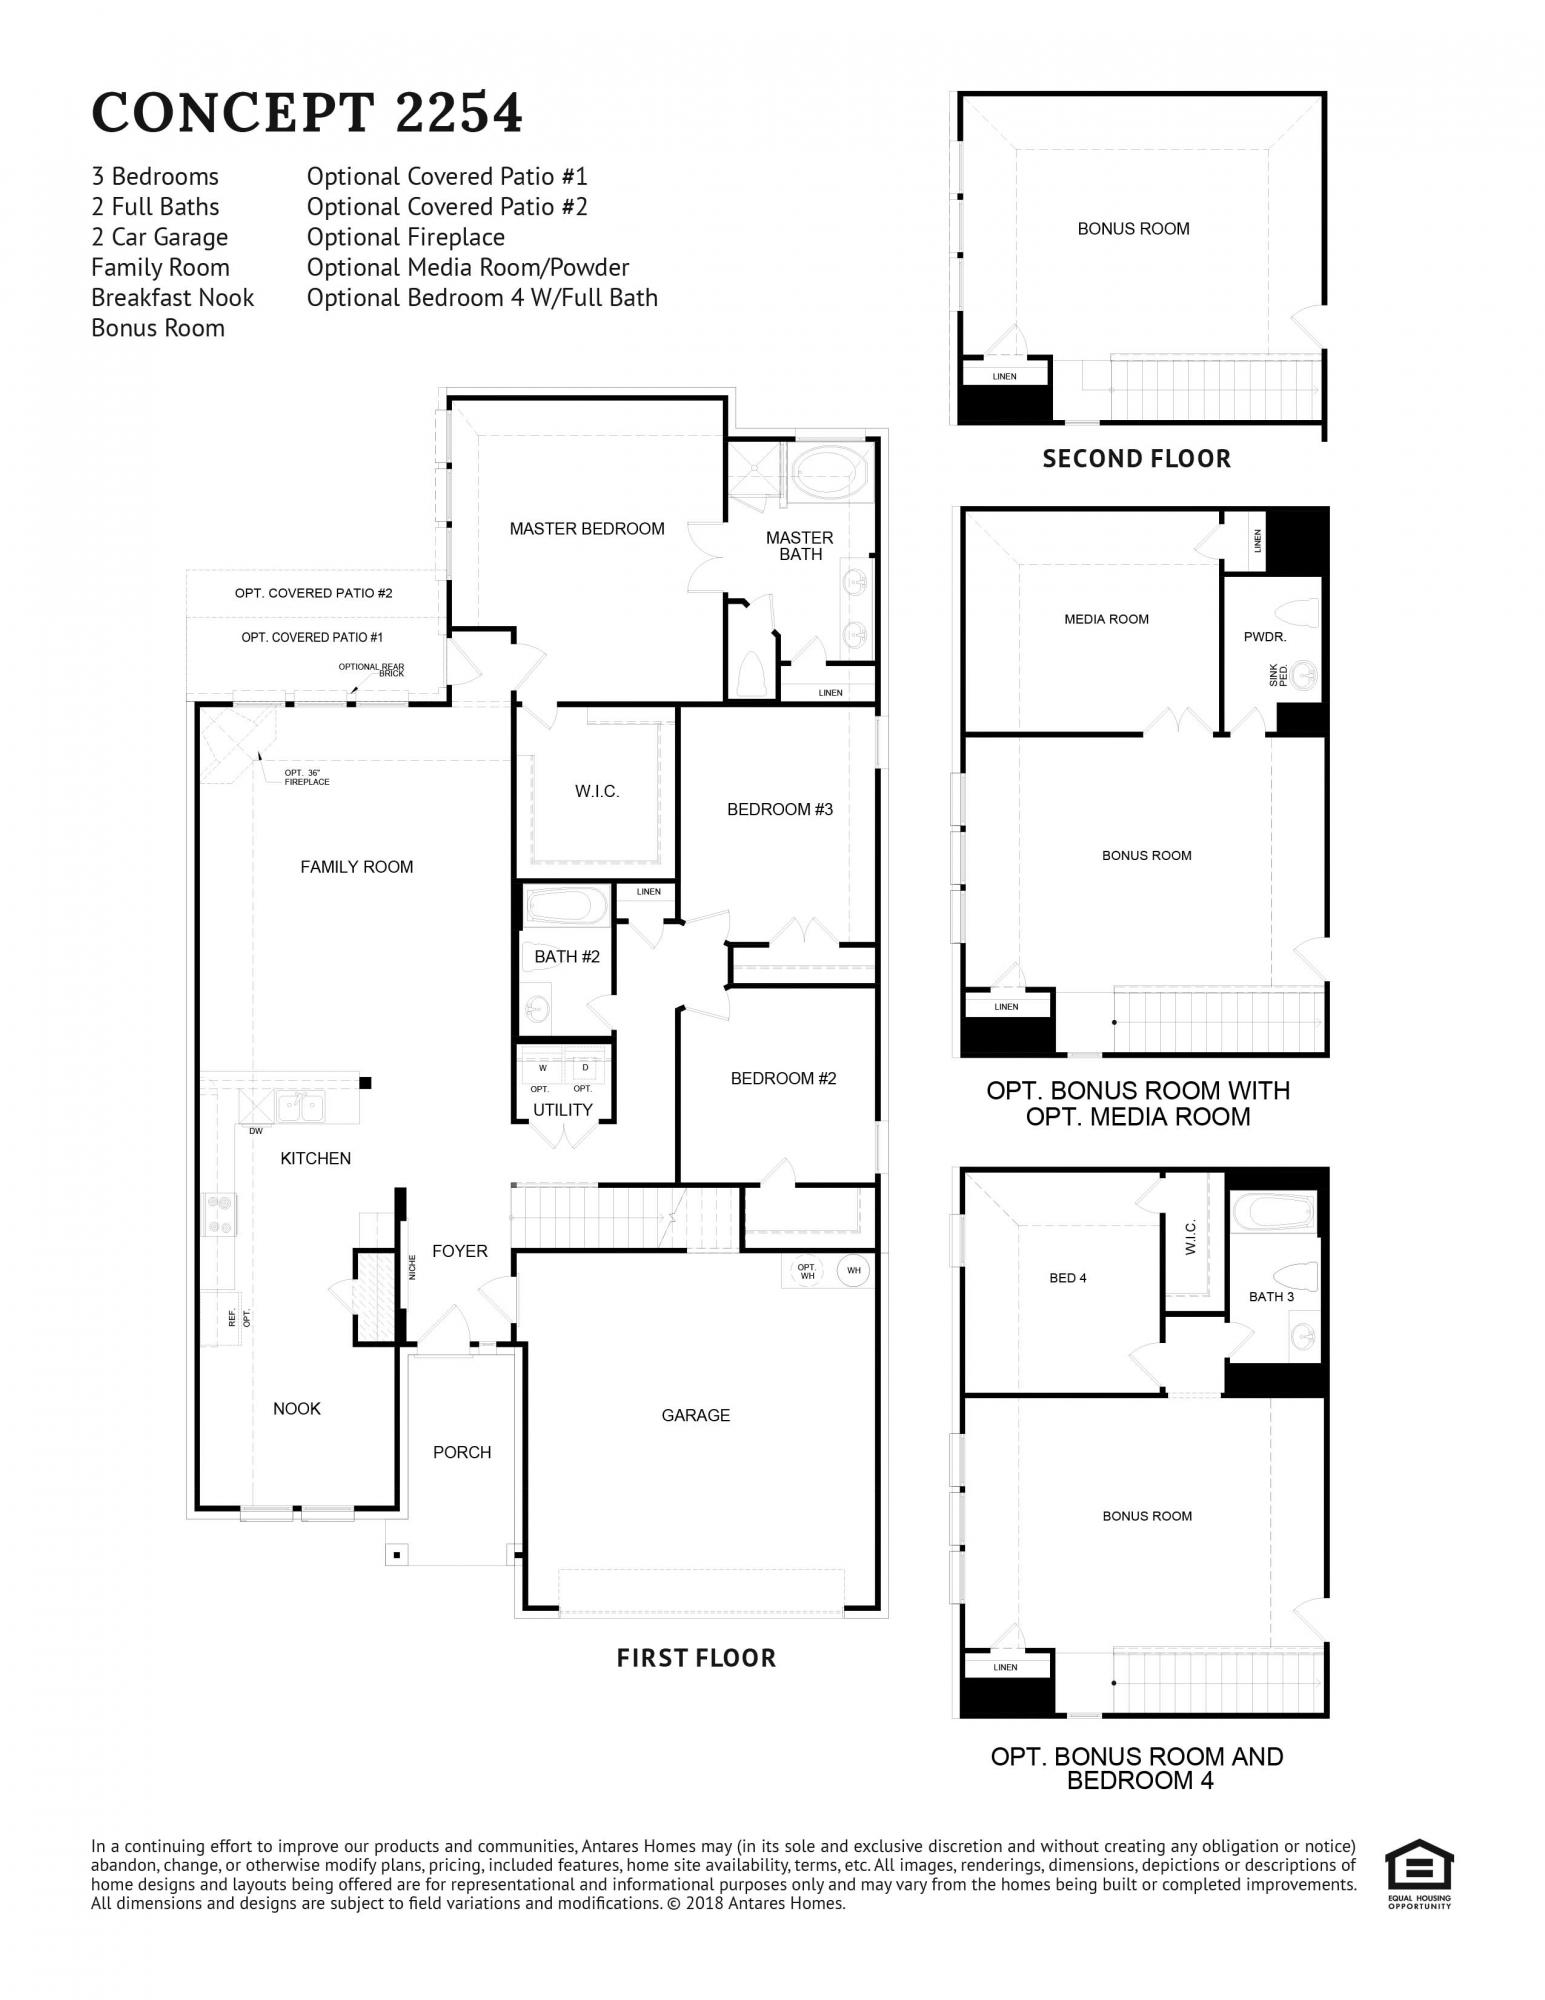 Concept 2254 Floorplan